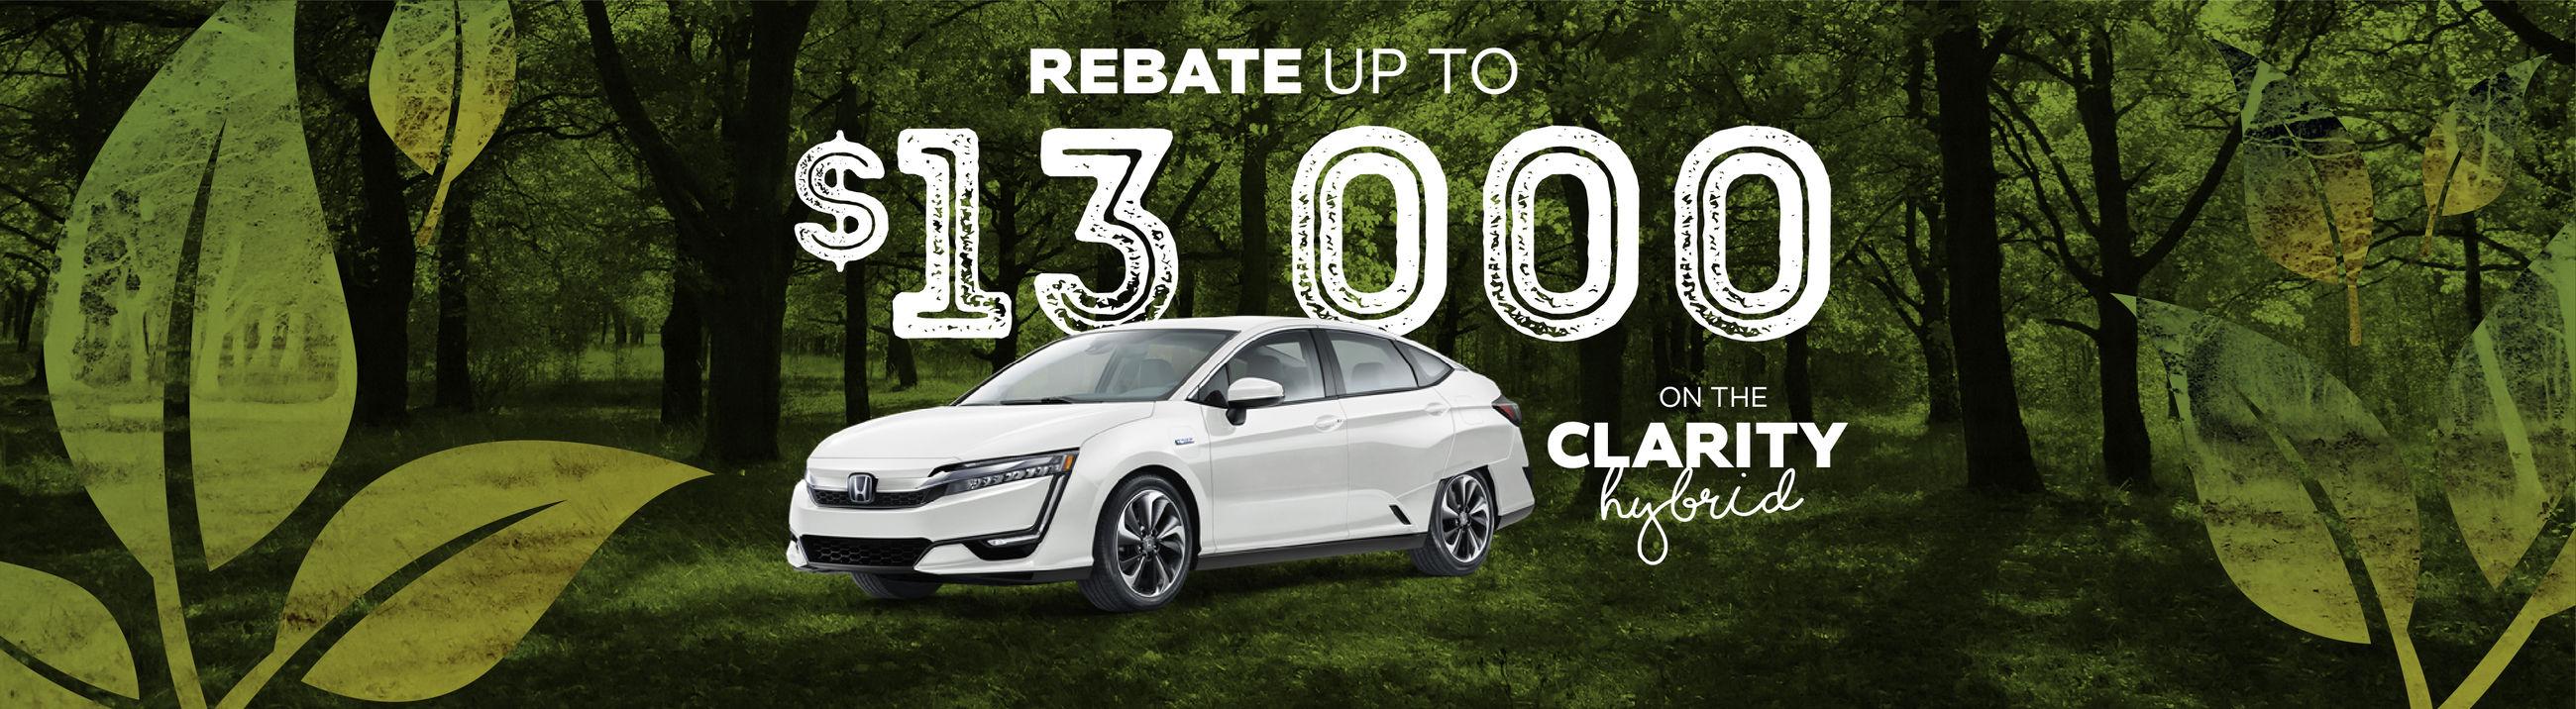 Honda Clarity hybrid $8000 rebate